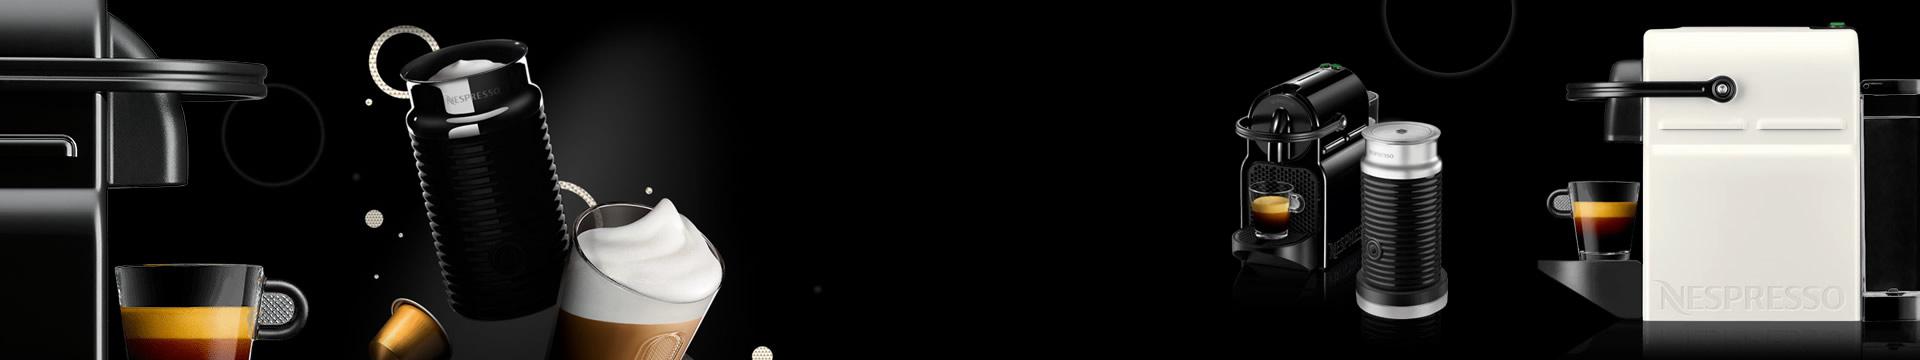 Banner image of Nespresso